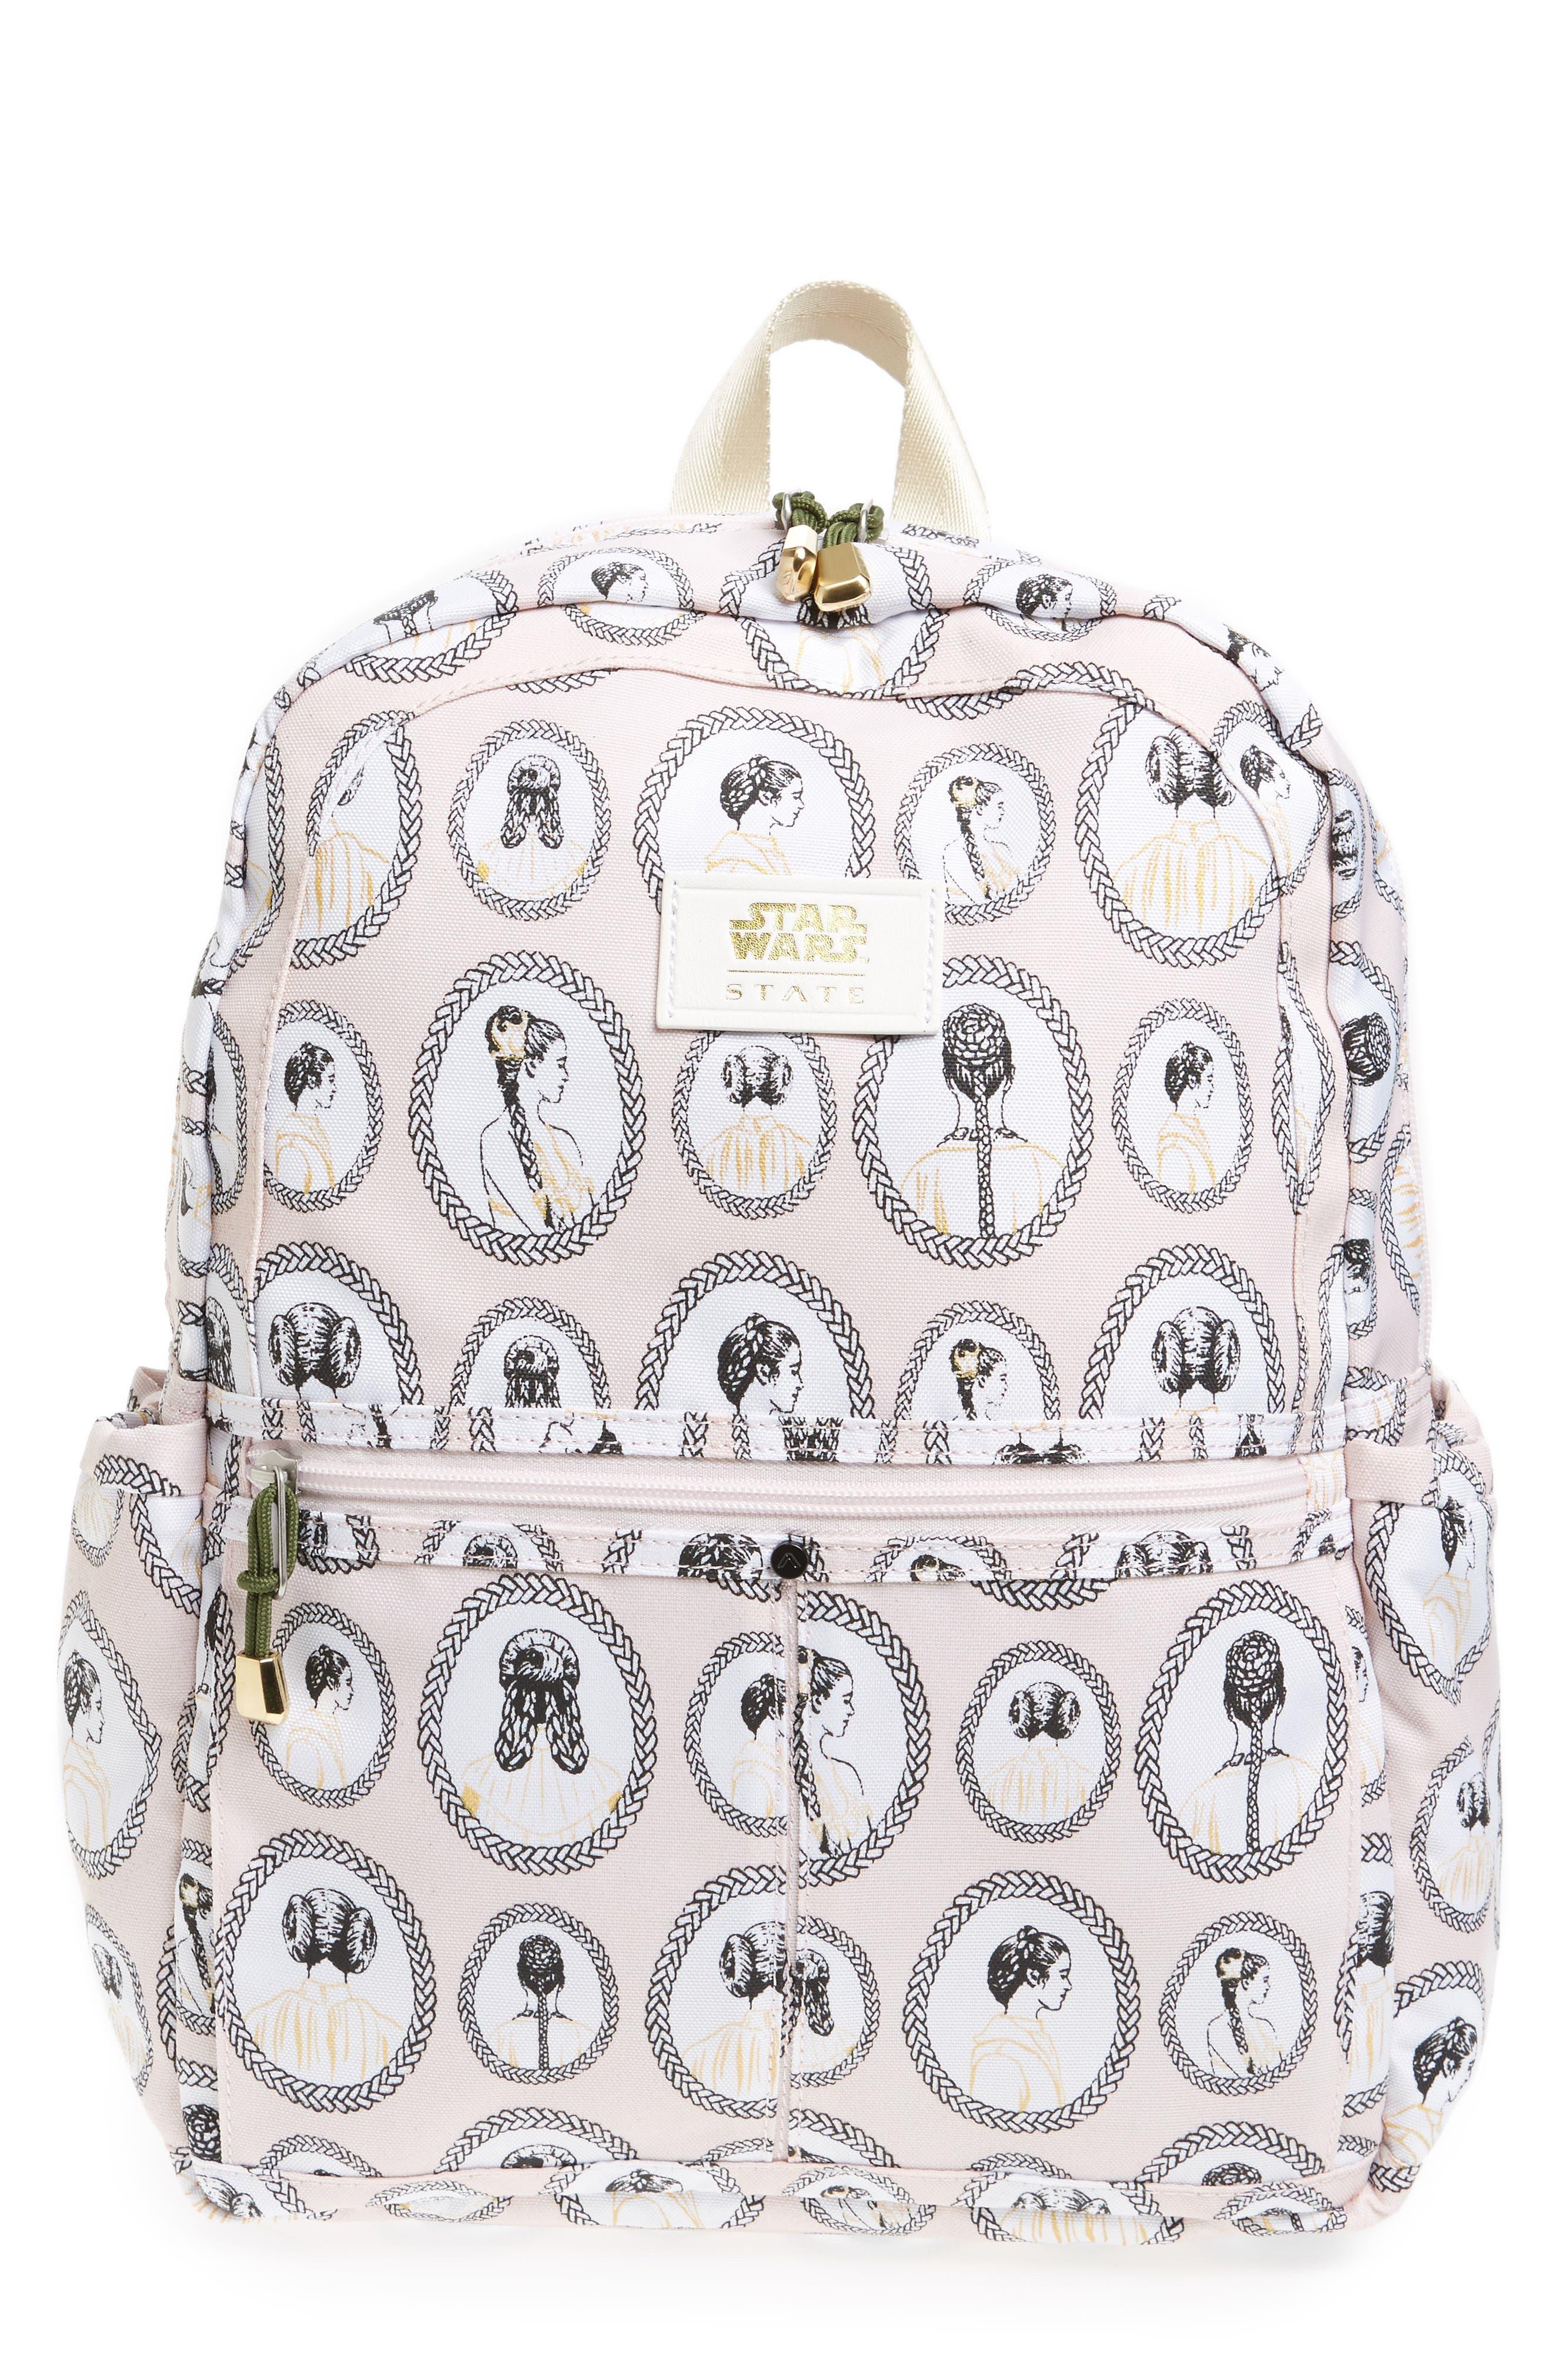 Star Wars - Princess Leia Kane Backpack,                         Main,                         color, Pink Princess Leia